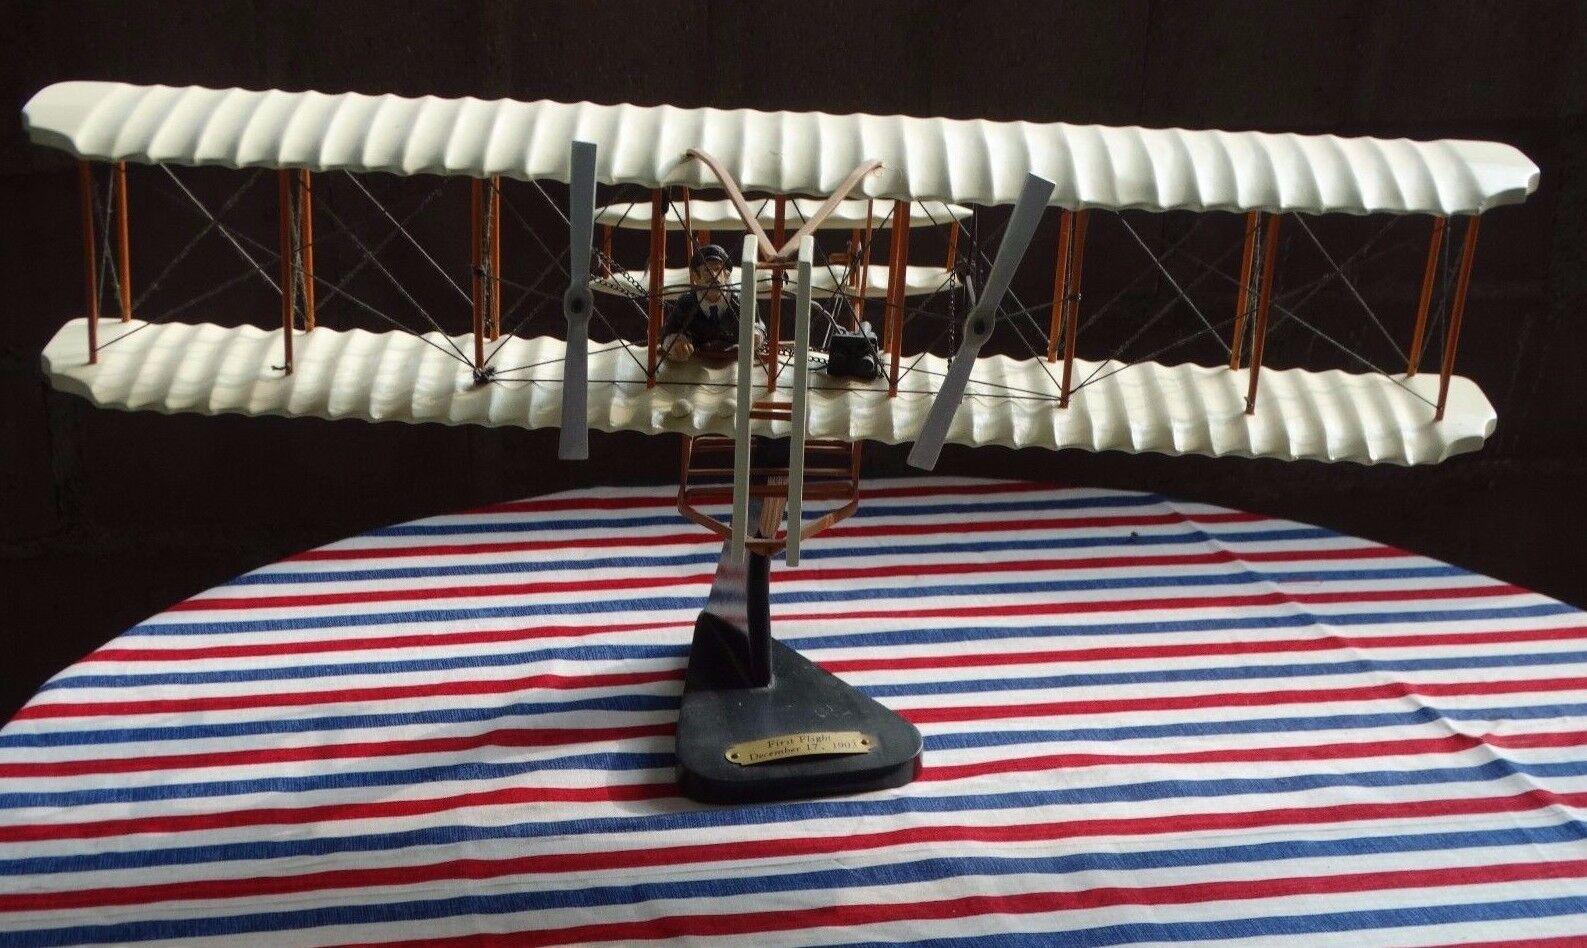 Danbury Mint Wright Bros. First Flight Airplane Wood Model 1 32 Scale Kitty Hawk